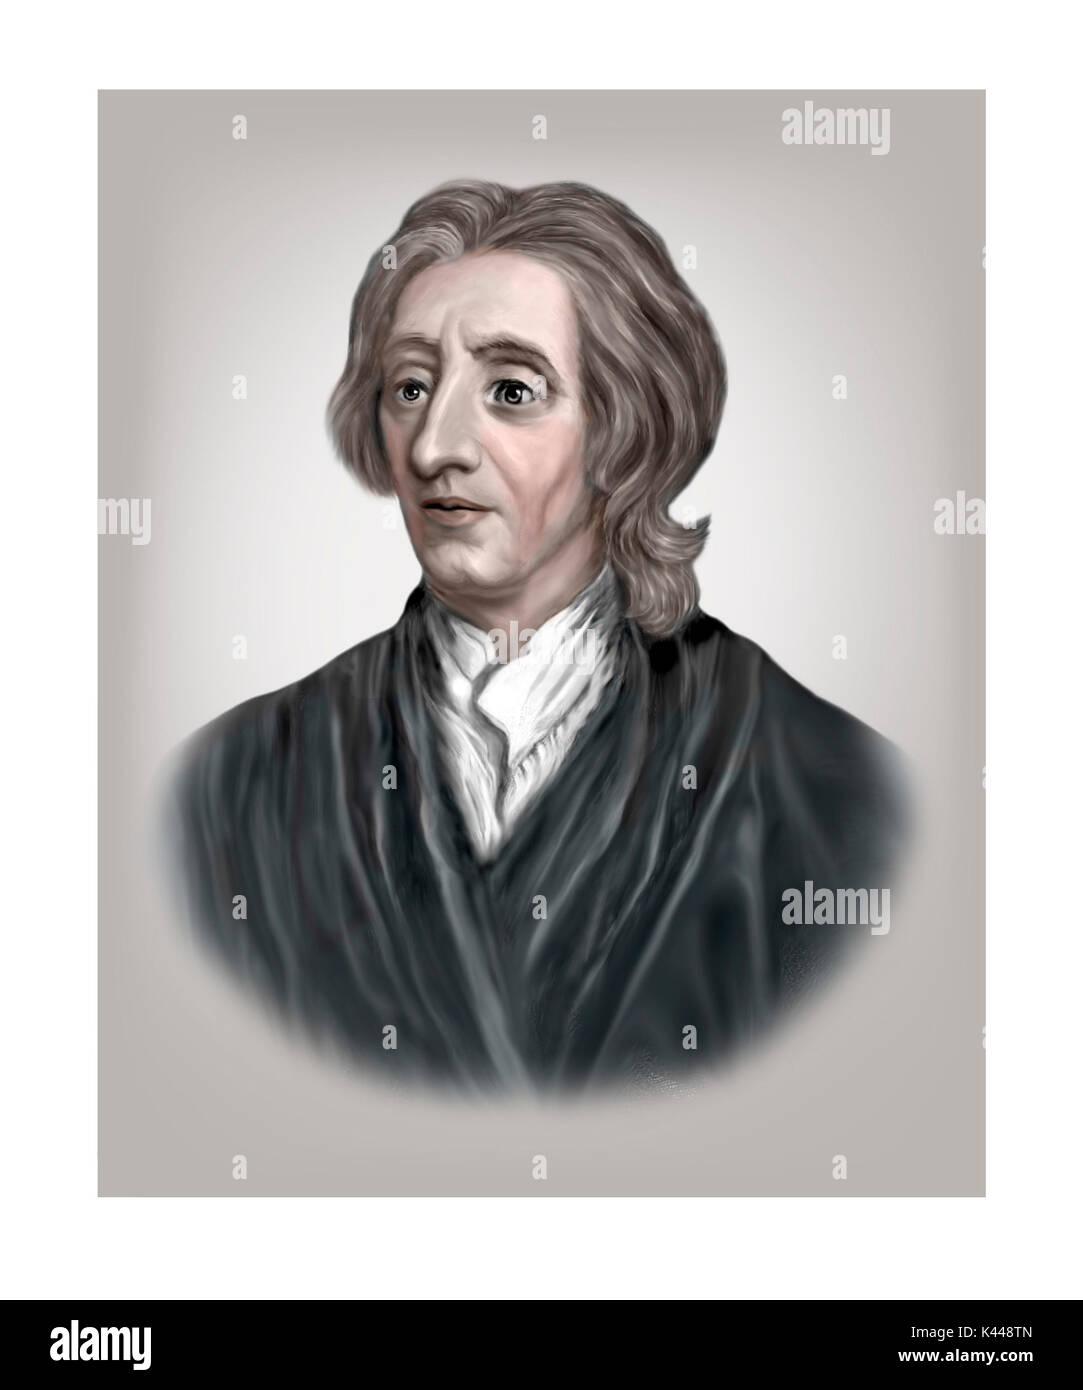 John Locke, 1632 - 1704, englischer Philosoph, Arzt Stockbild